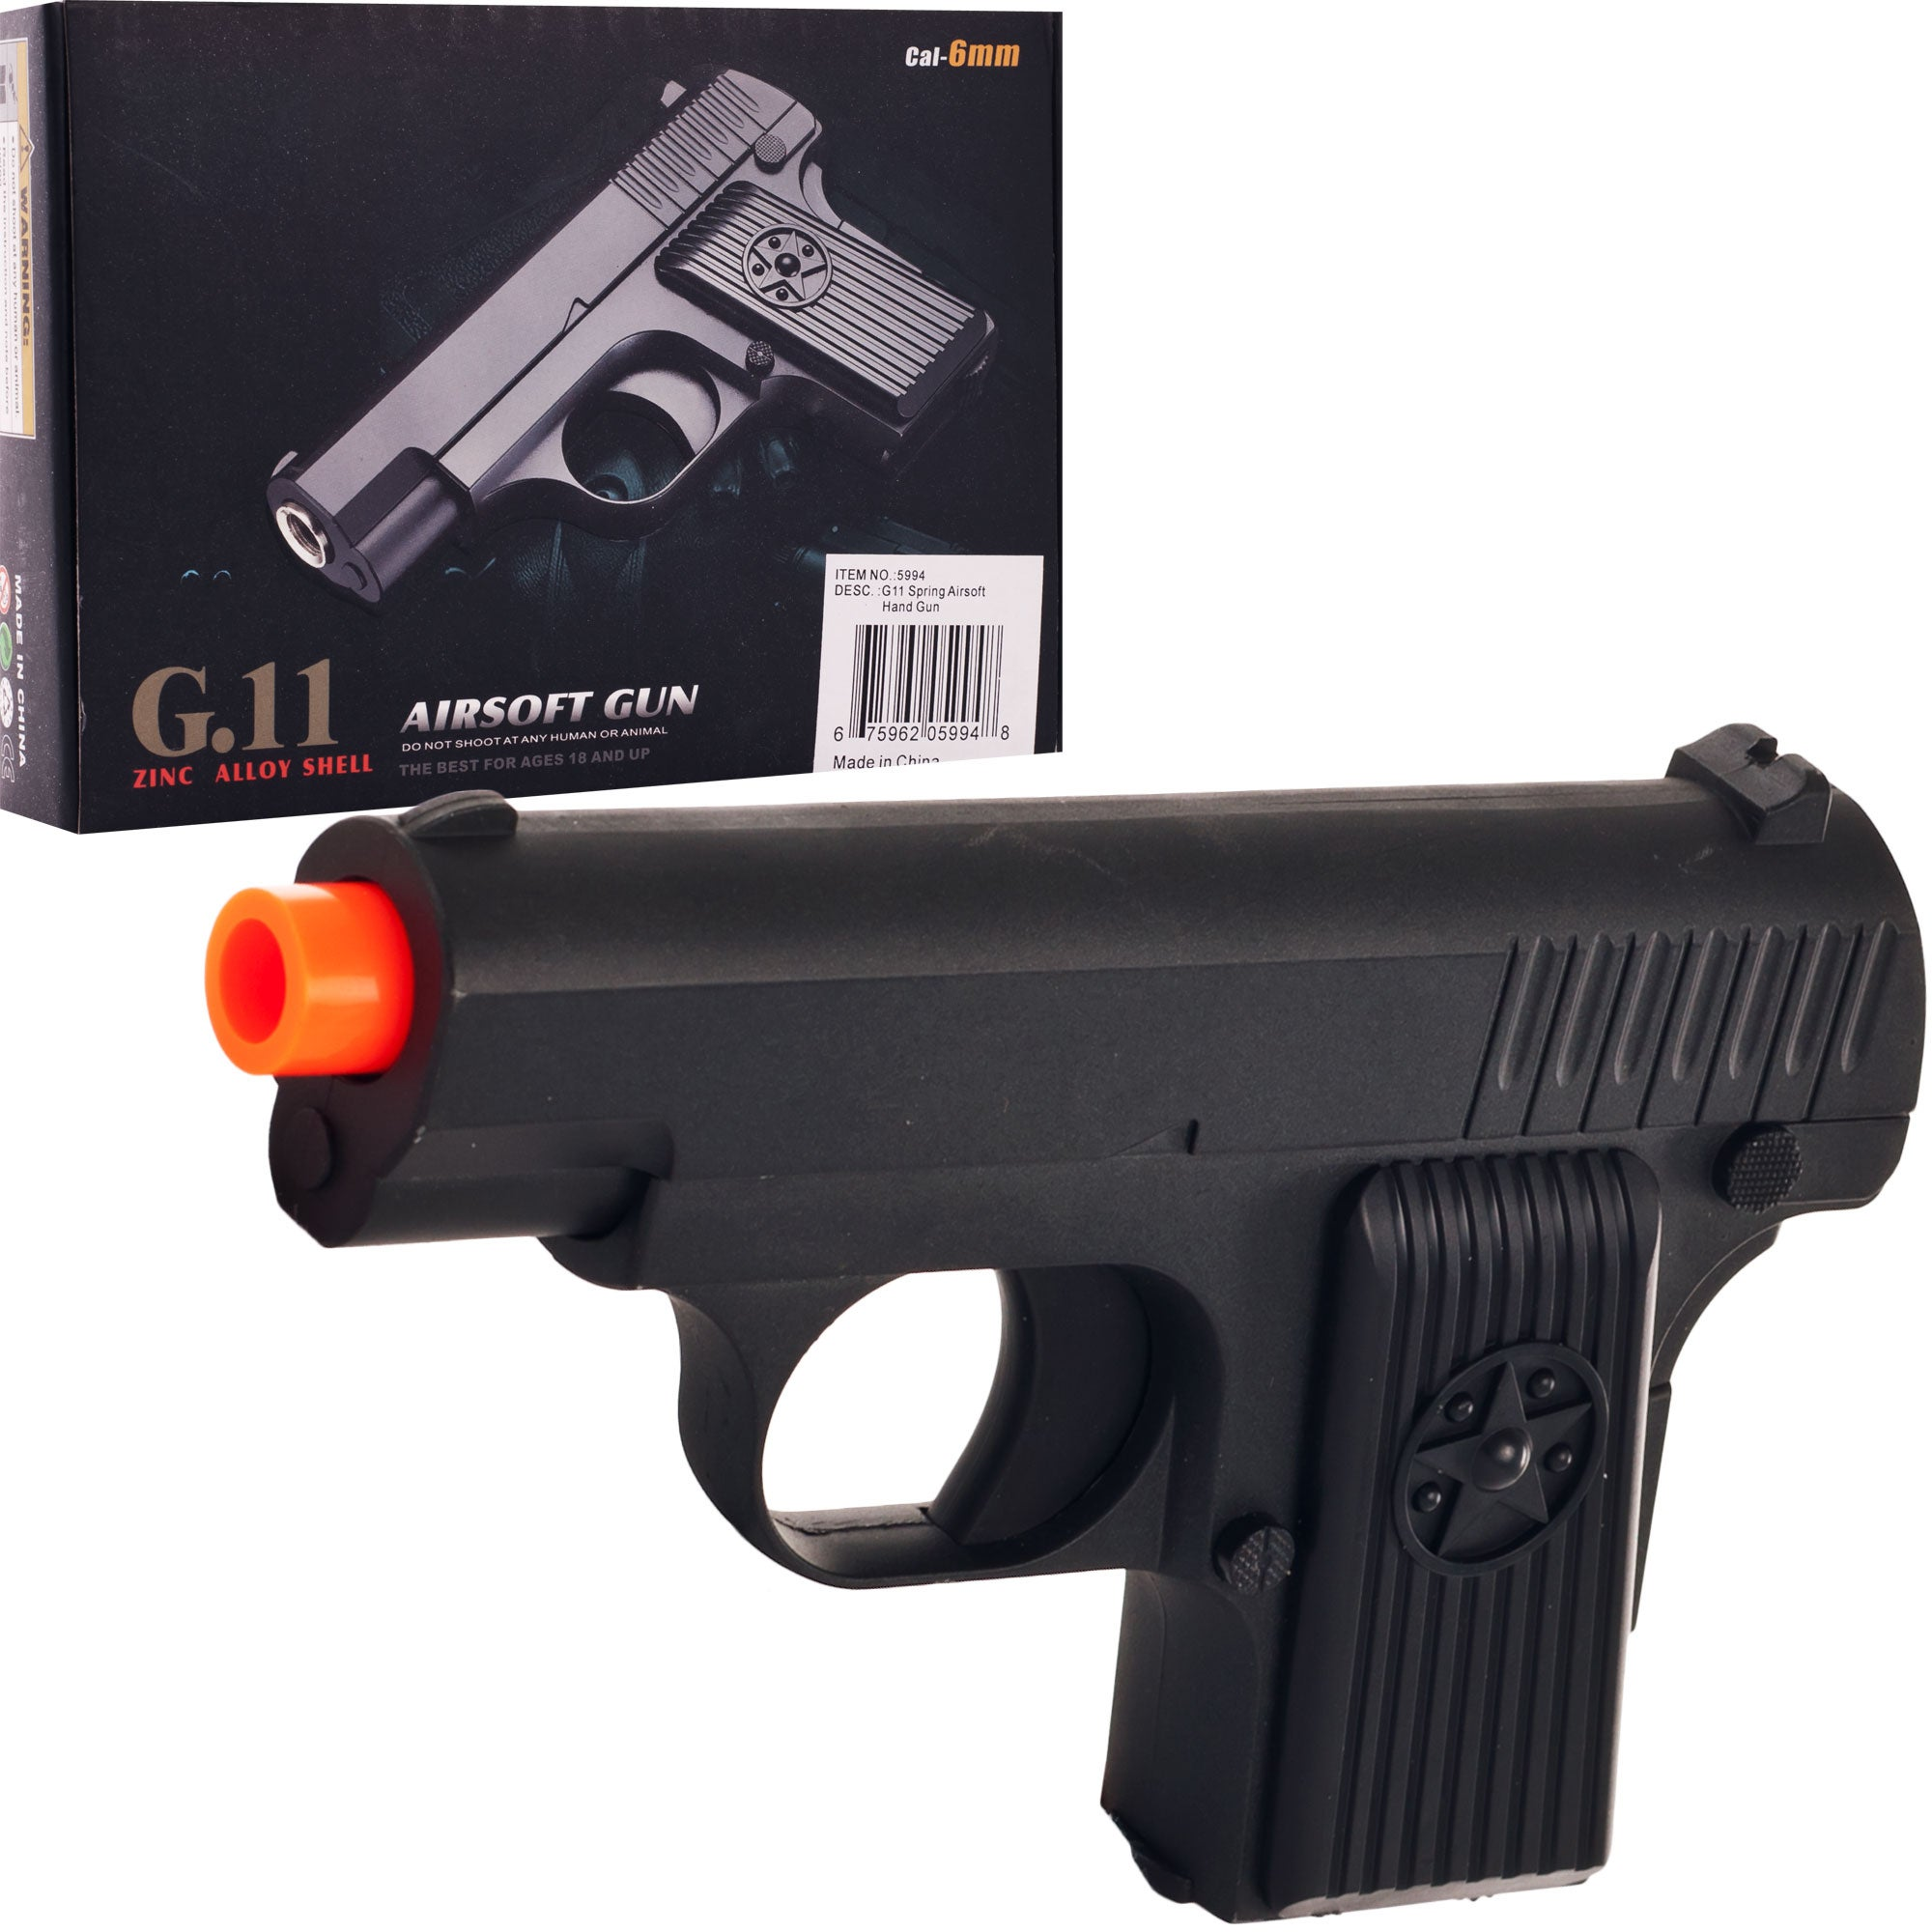 Whetstone G.11 Zinc Alloy Shell Airsoft Pistol